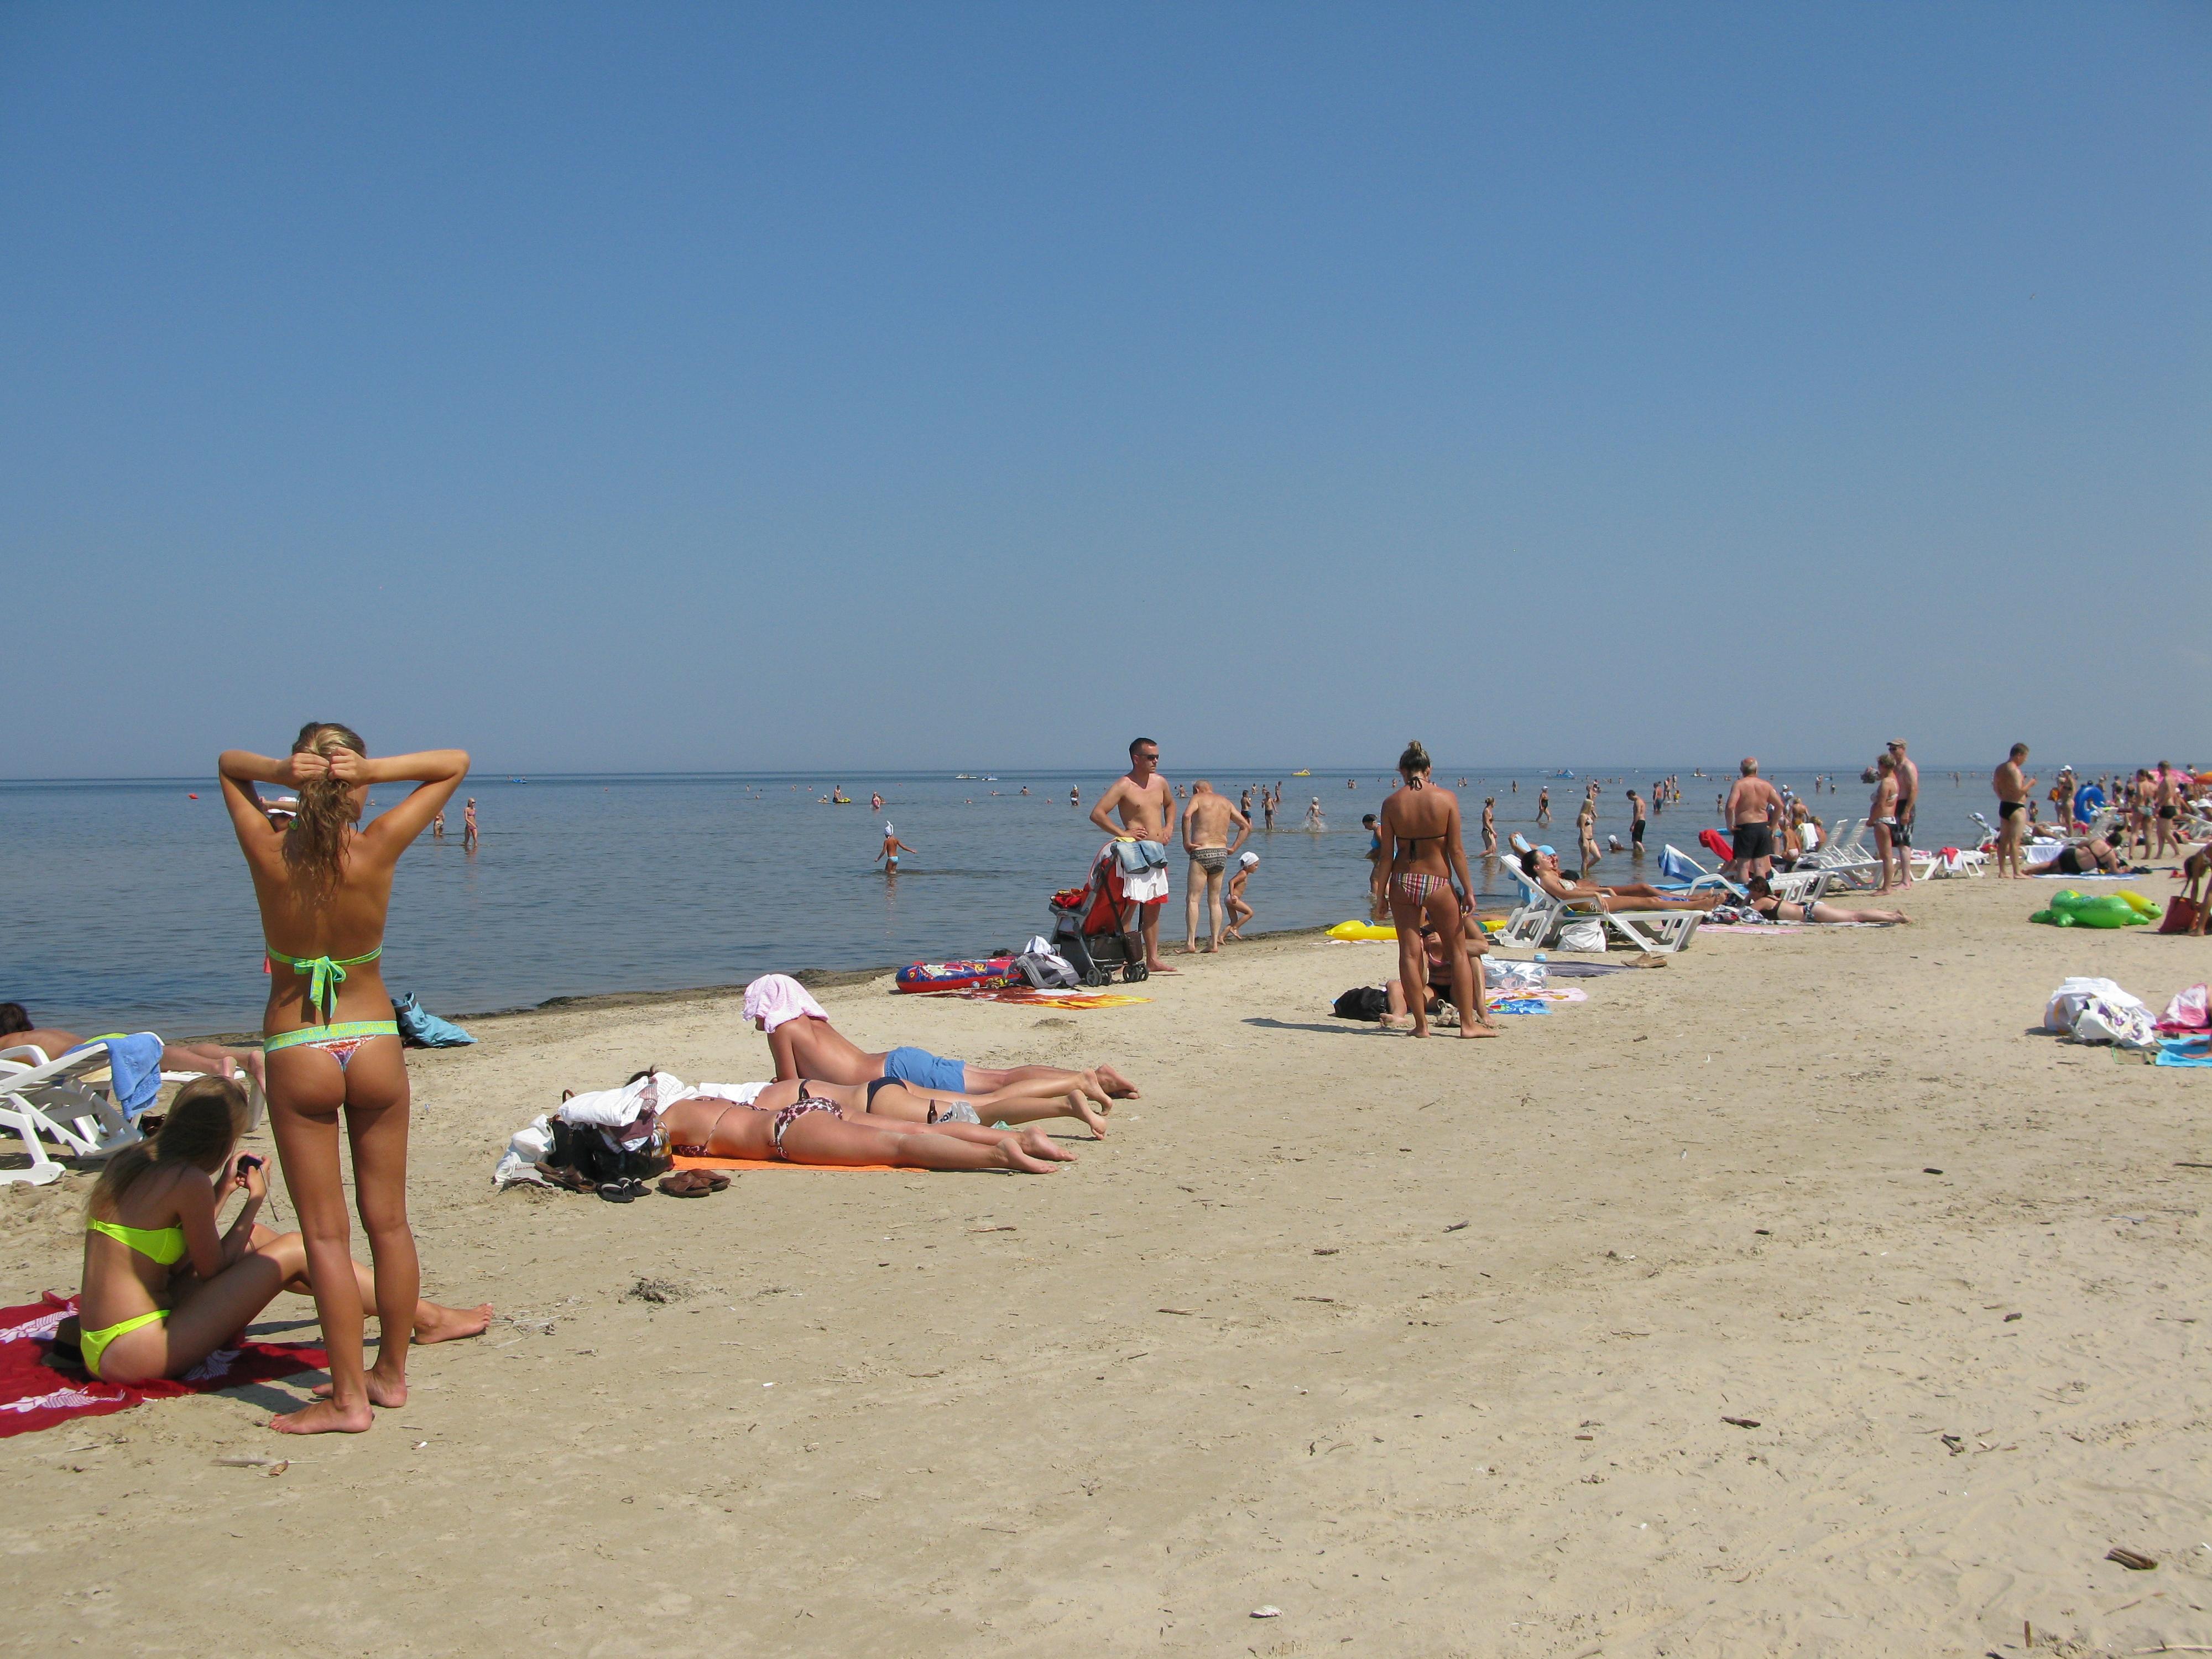 Fotos de Playa nudista - Imgenes - minubecommx